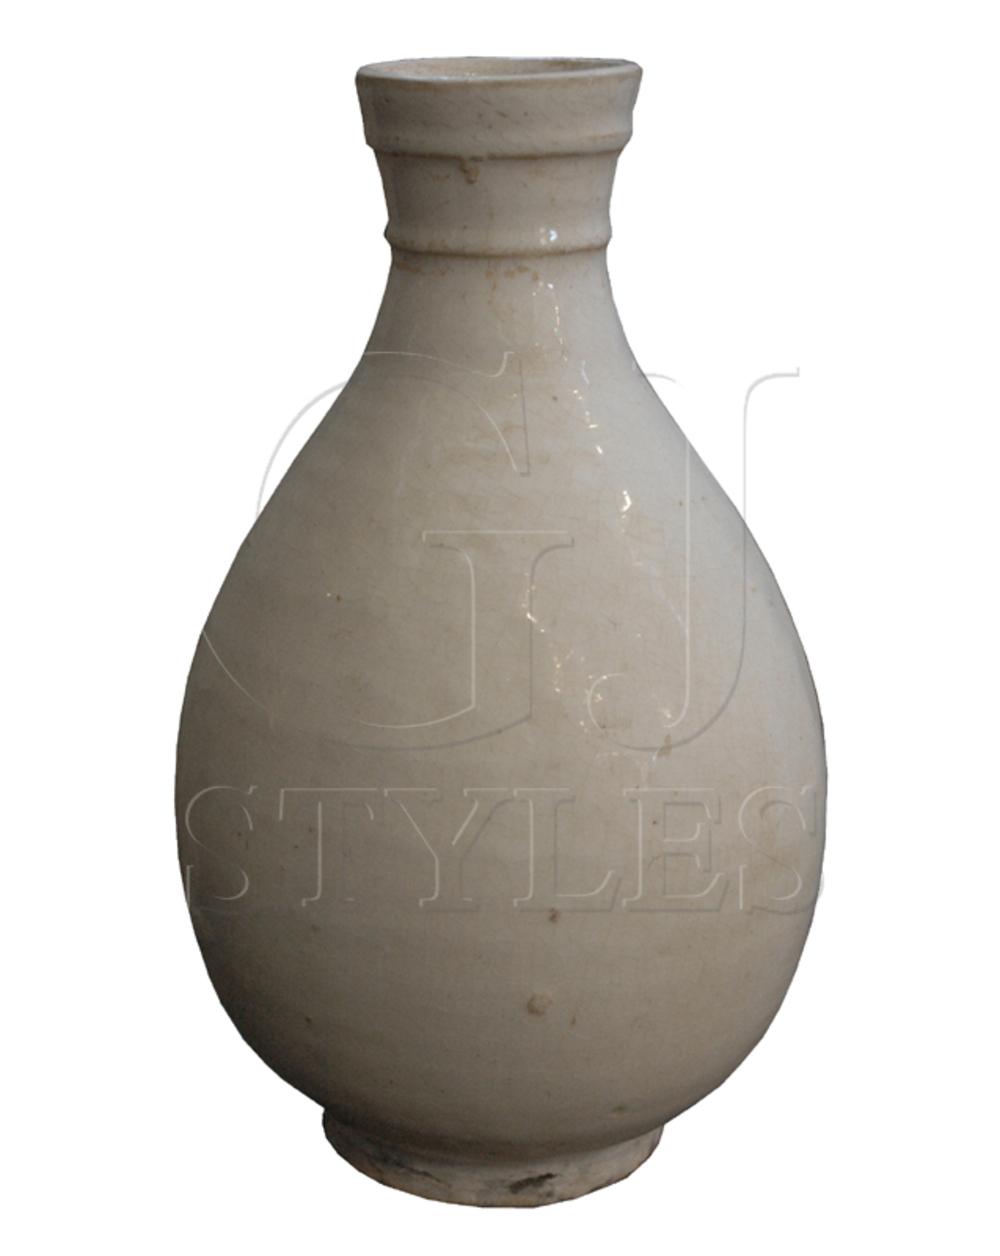 GJ Styles - White Porcelain Small Round Vase